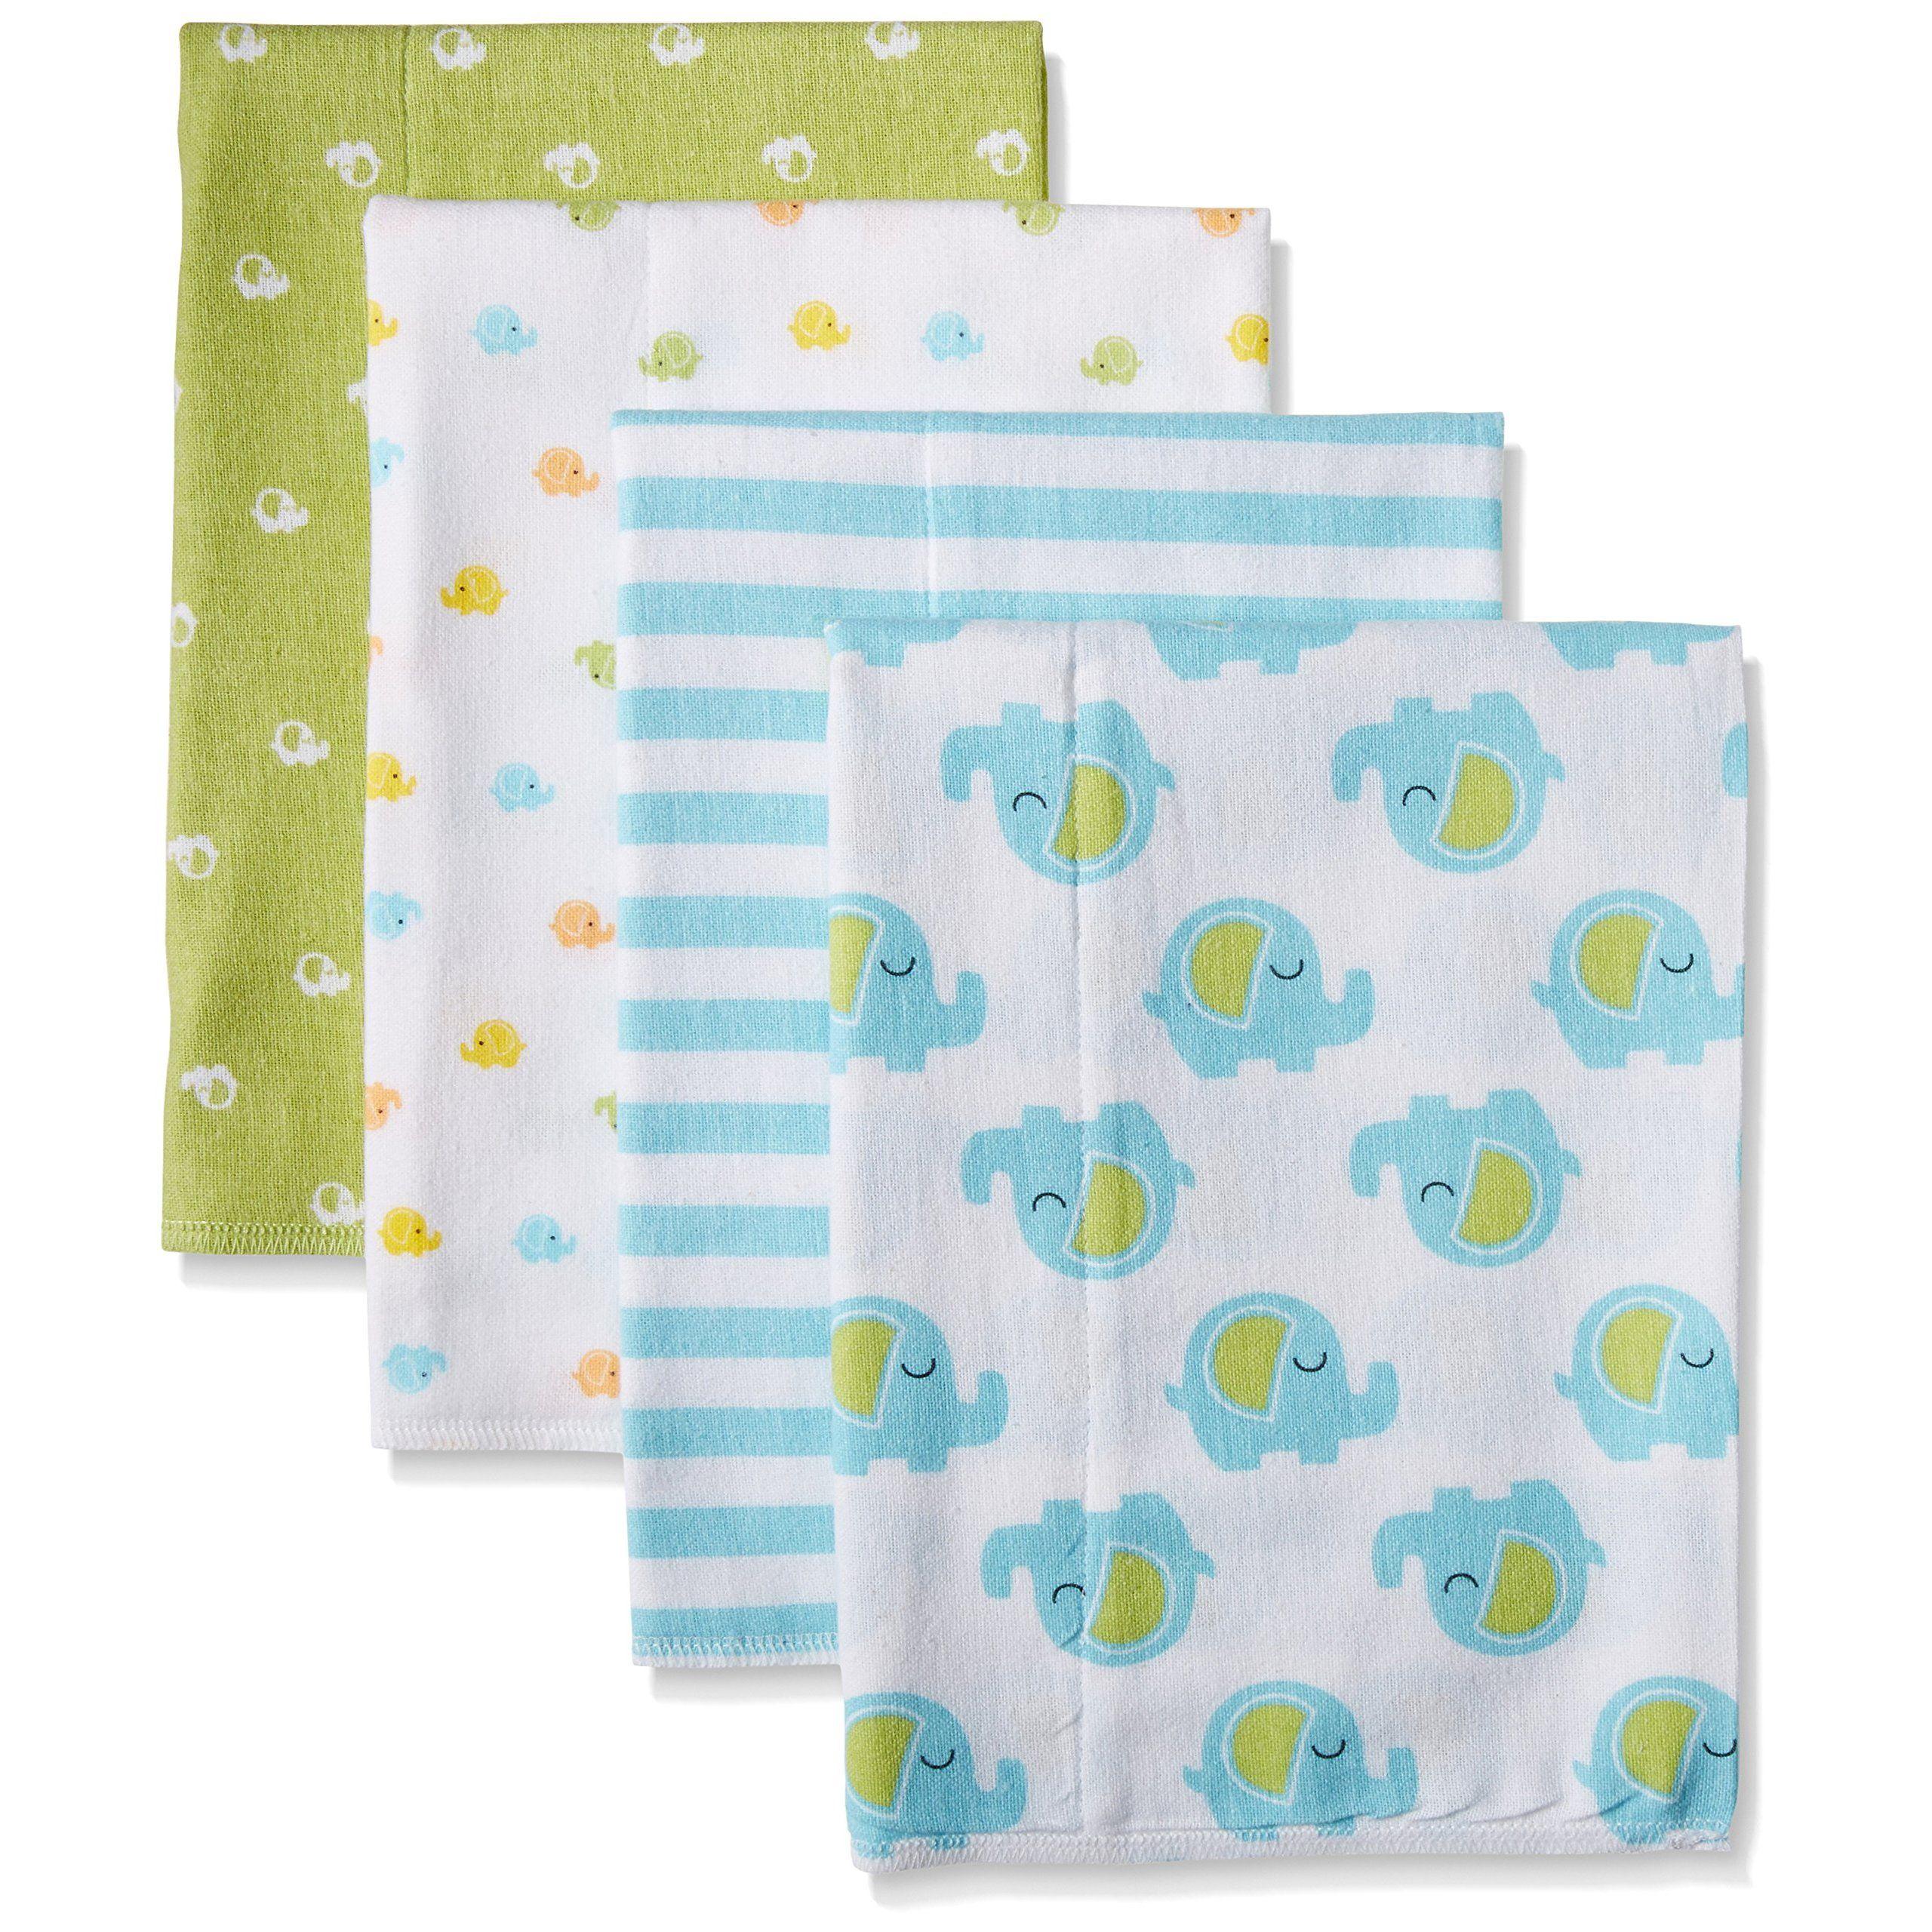 Gerber Unisex Baby 4 Pack Print Flannel Burp Cloth - Amazon - NEED!